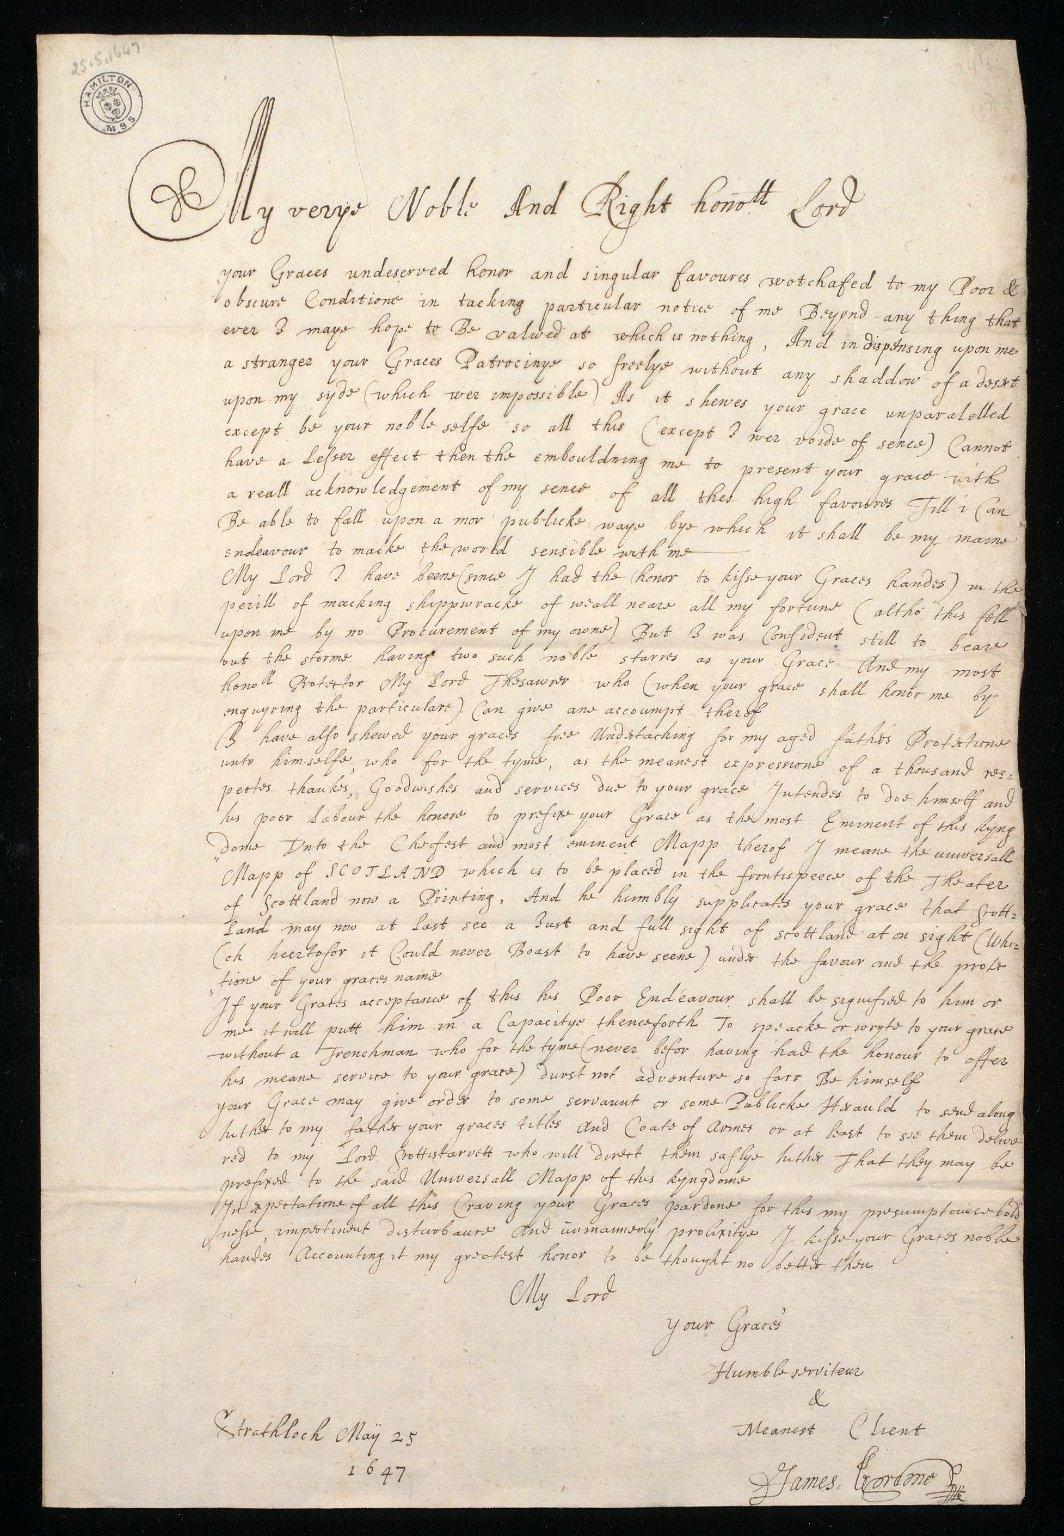 [Letter from James Gordon, Strathloch, to the Duke of Hamilton, 25 May 1647, [1 of 2]